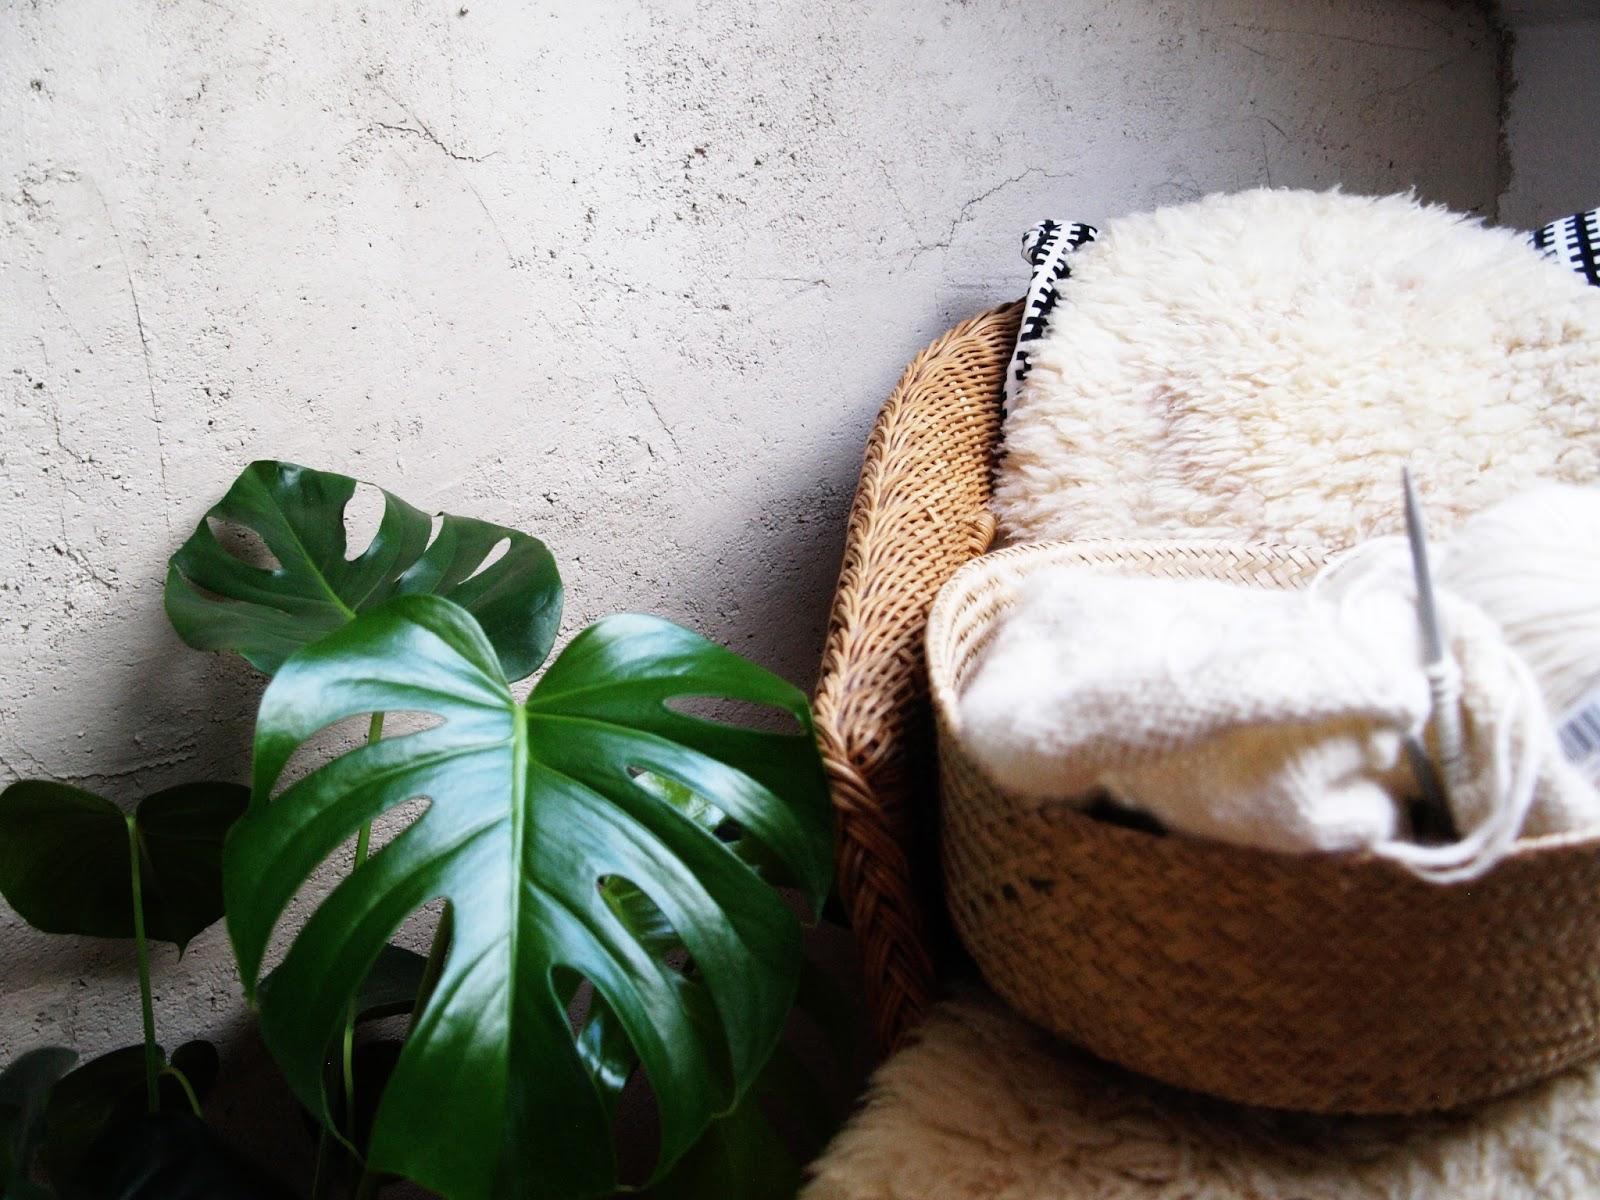 gartennymphe eine wand in betonoptik. Black Bedroom Furniture Sets. Home Design Ideas